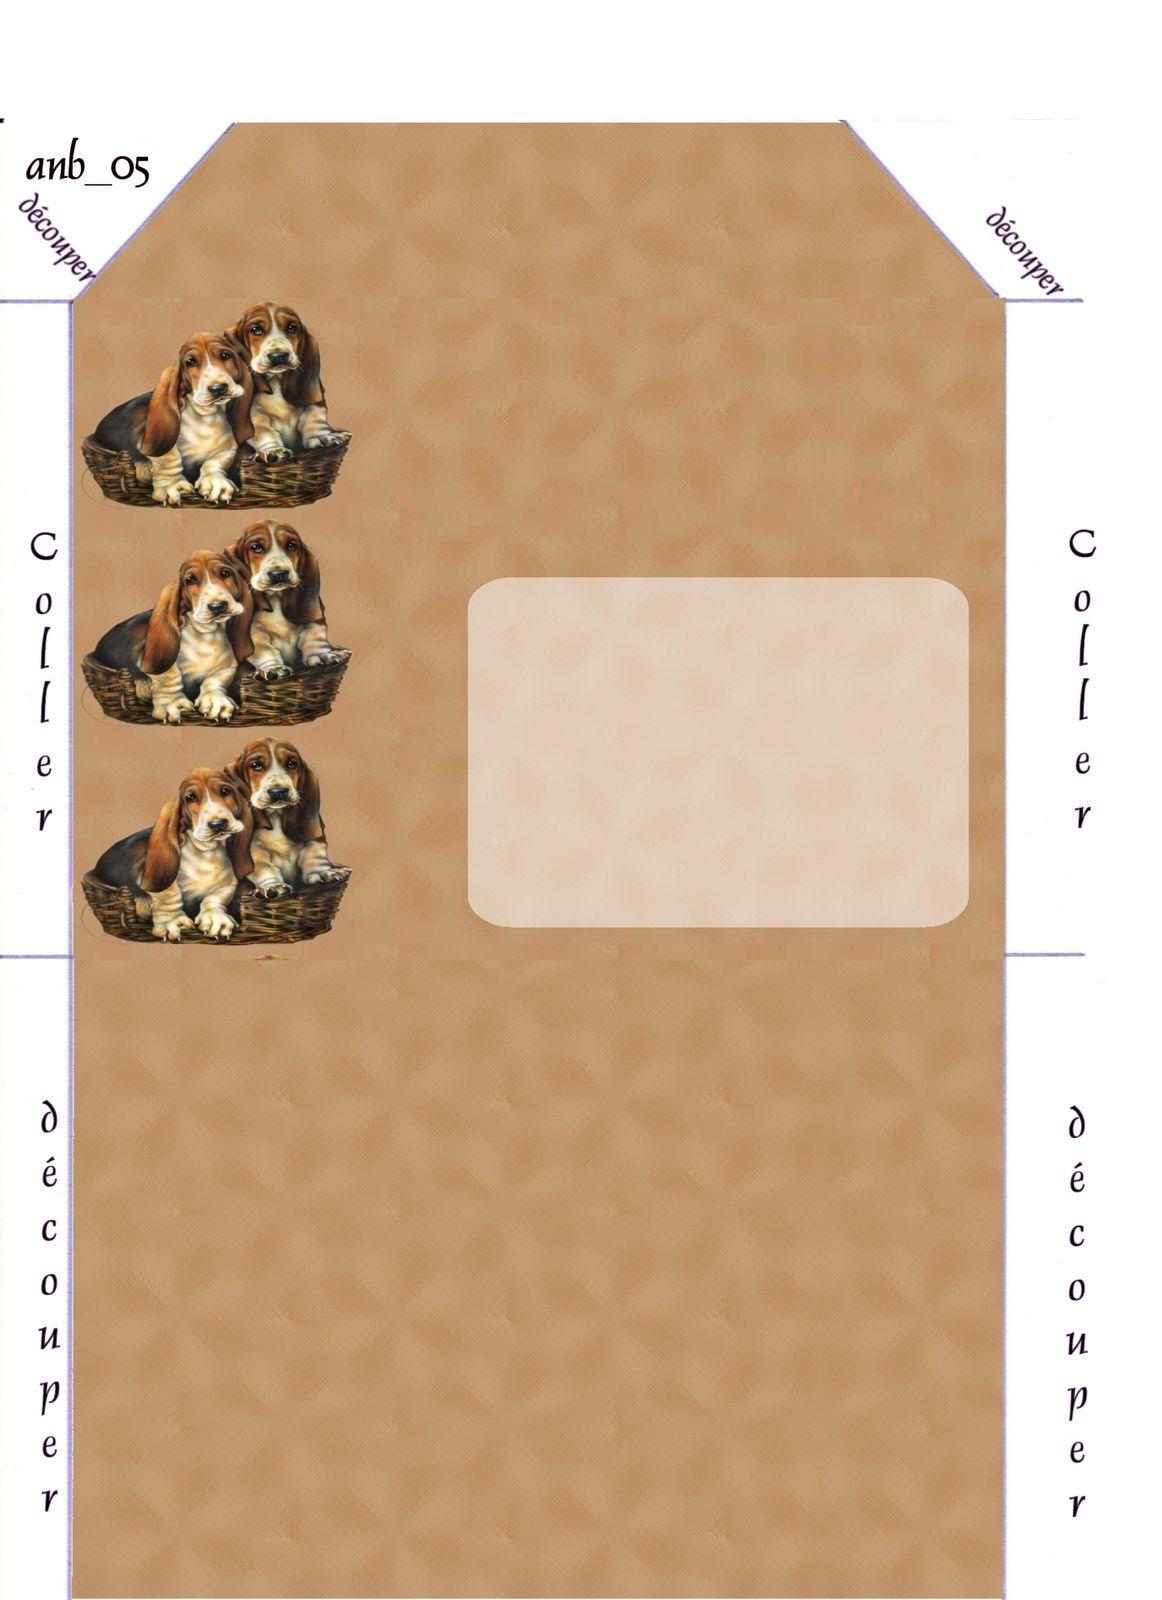 Chiens panier Incredimail &amp&#x3B; Papier A4 h l &amp&#x3B; outlook &amp&#x3B; enveloppe &amp&#x3B; 2 cartes A5 &amp&#x3B; signets 3 langues  chien_bassets_in_a_basket_lg